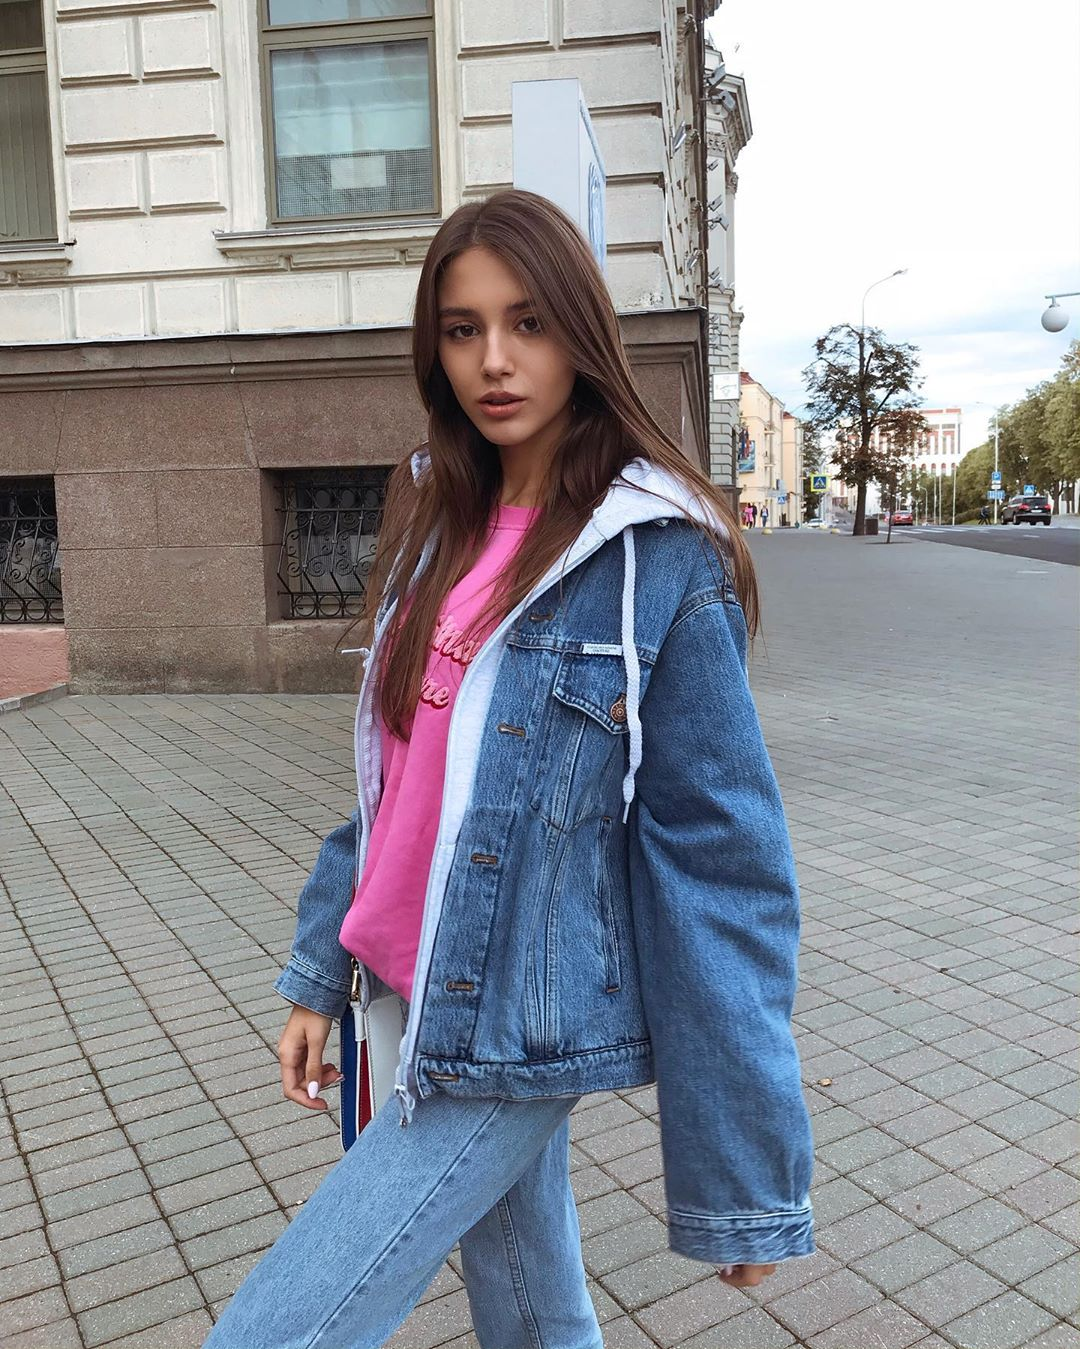 Elena-Fishman-Wallpapers-Insta-Fit-Bio-6